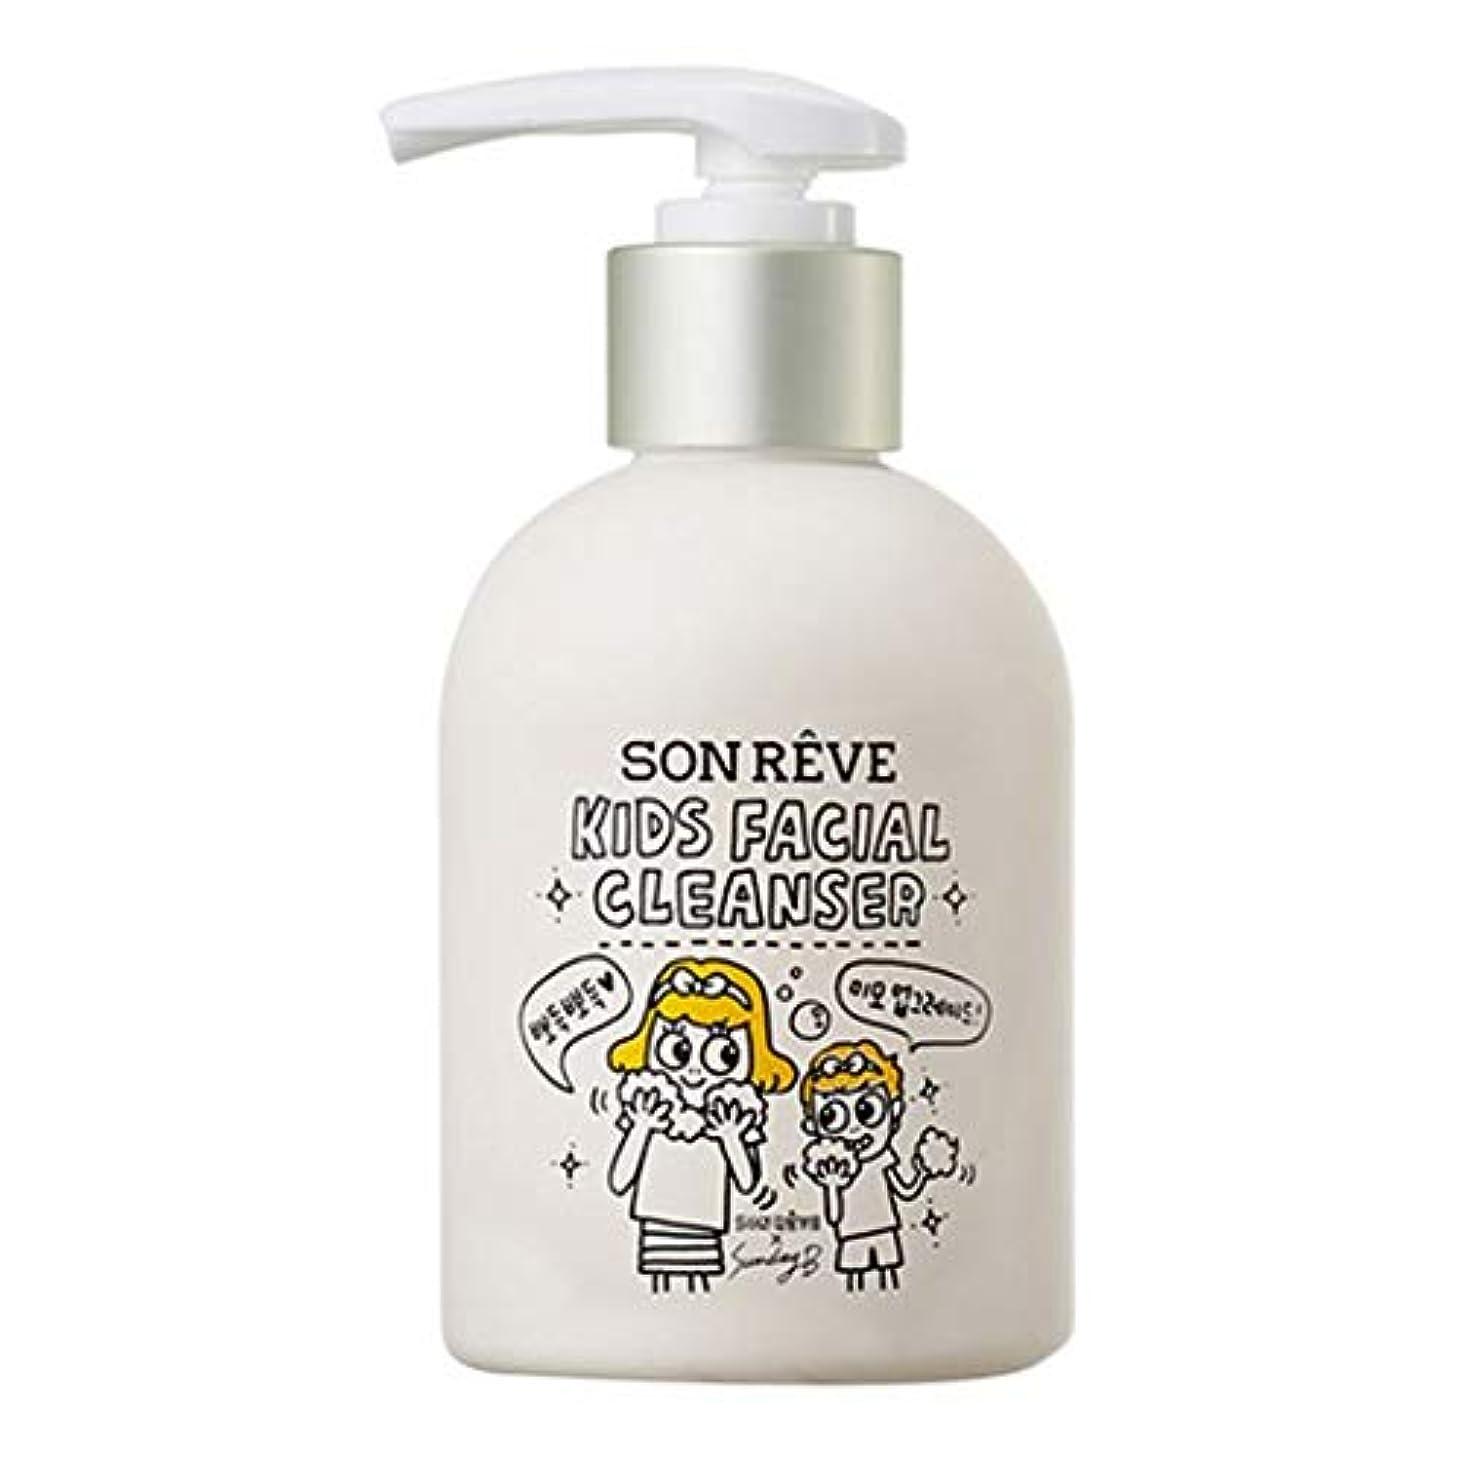 [SON REVE]KIDS Facial Cleanserの子どもの洗顔200ml甘いキャンディー 香りポンプ型[海外直輸入]